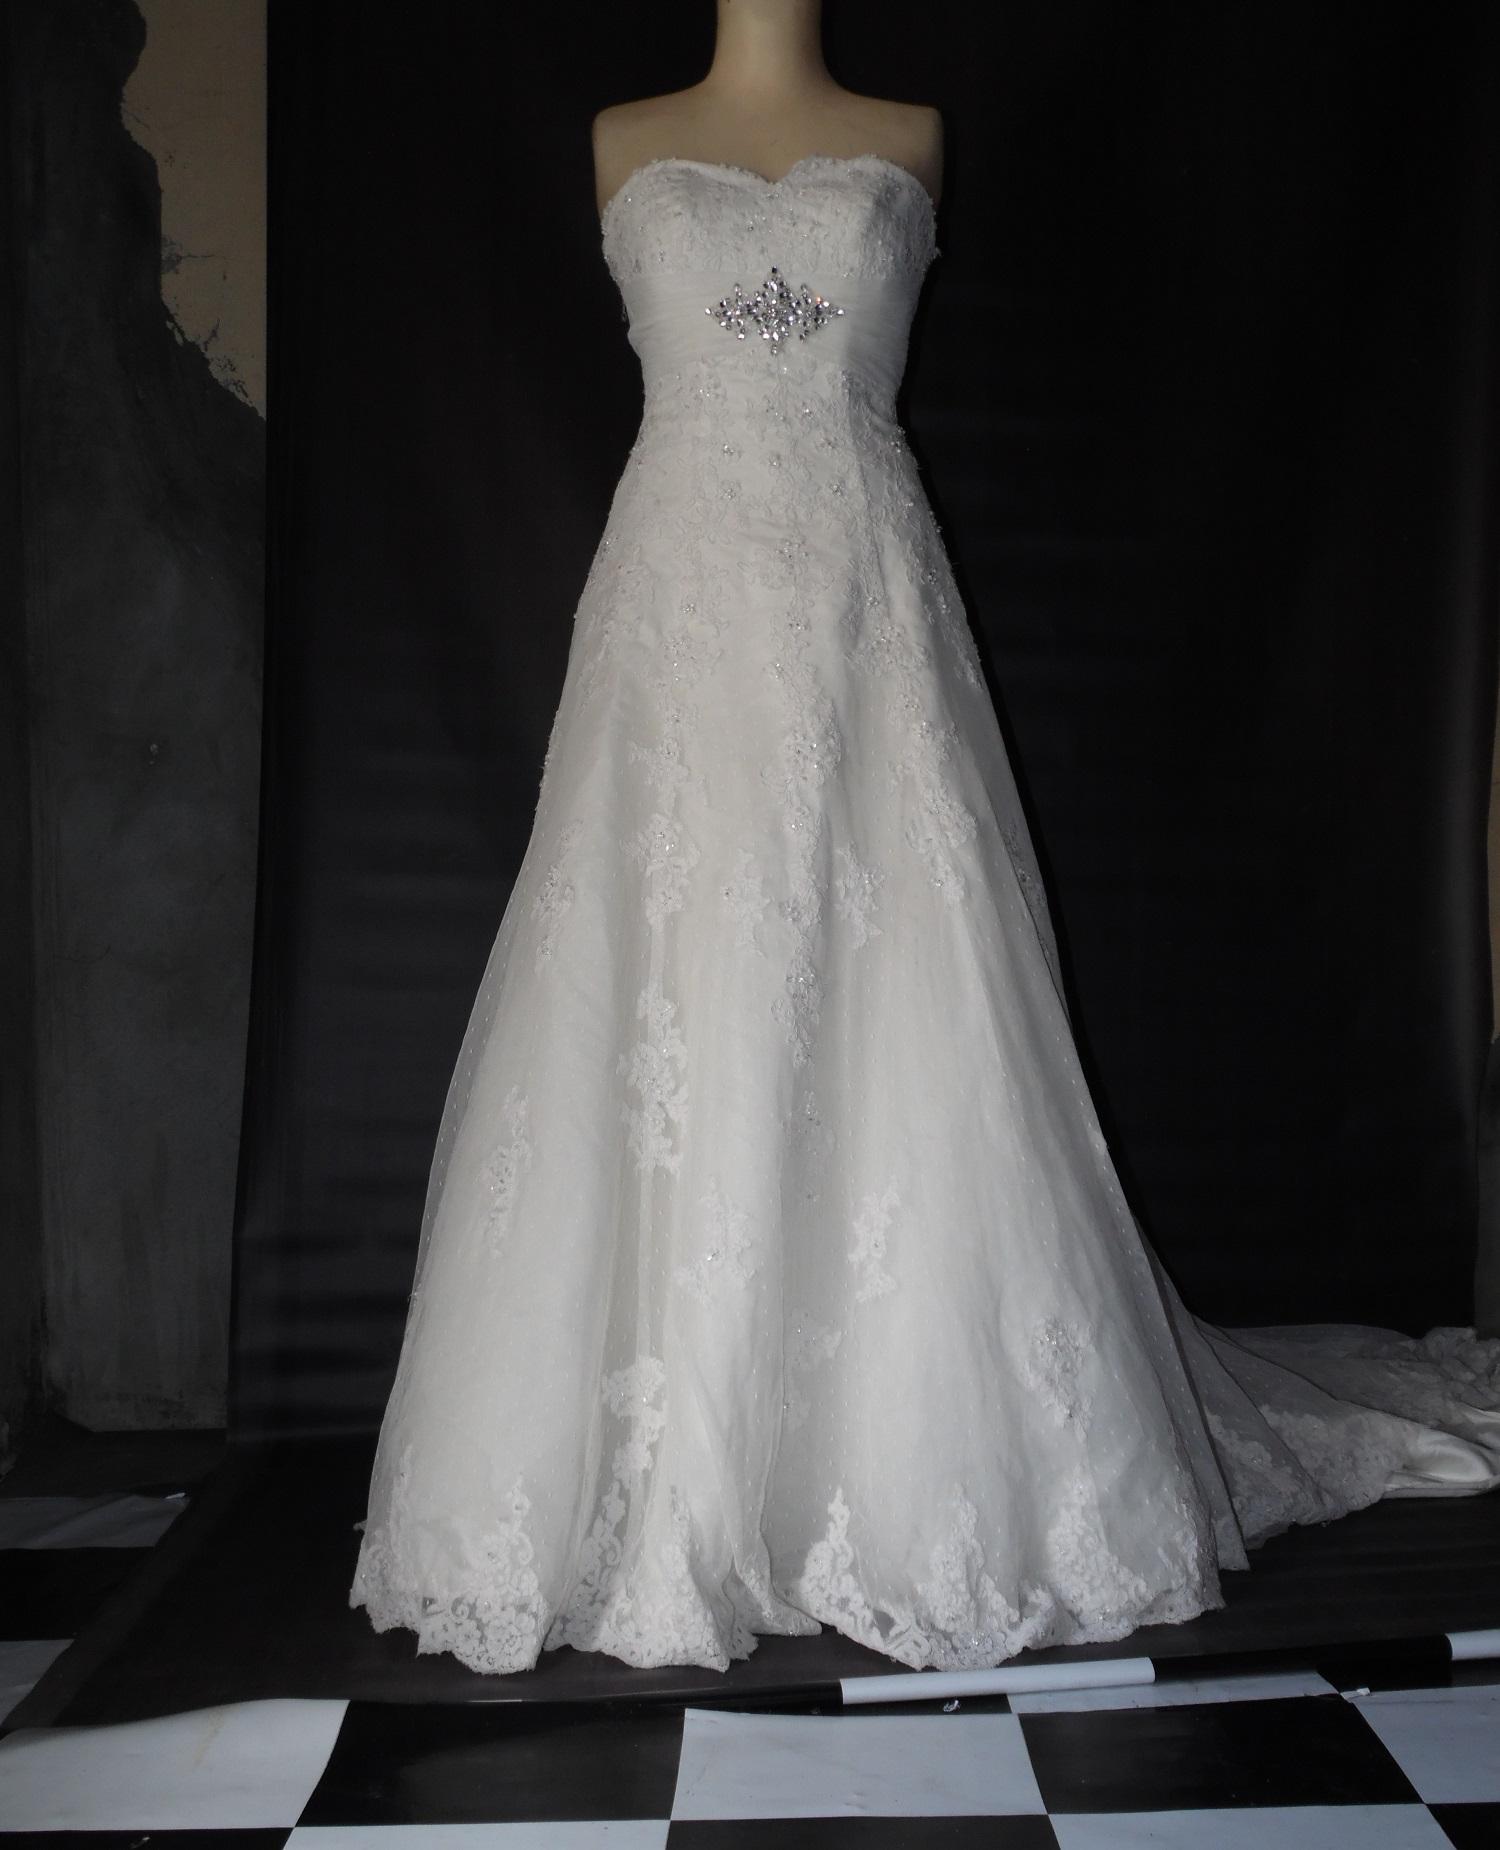 Lace Wedding Dress For Hire In Kenya Happy Wishy